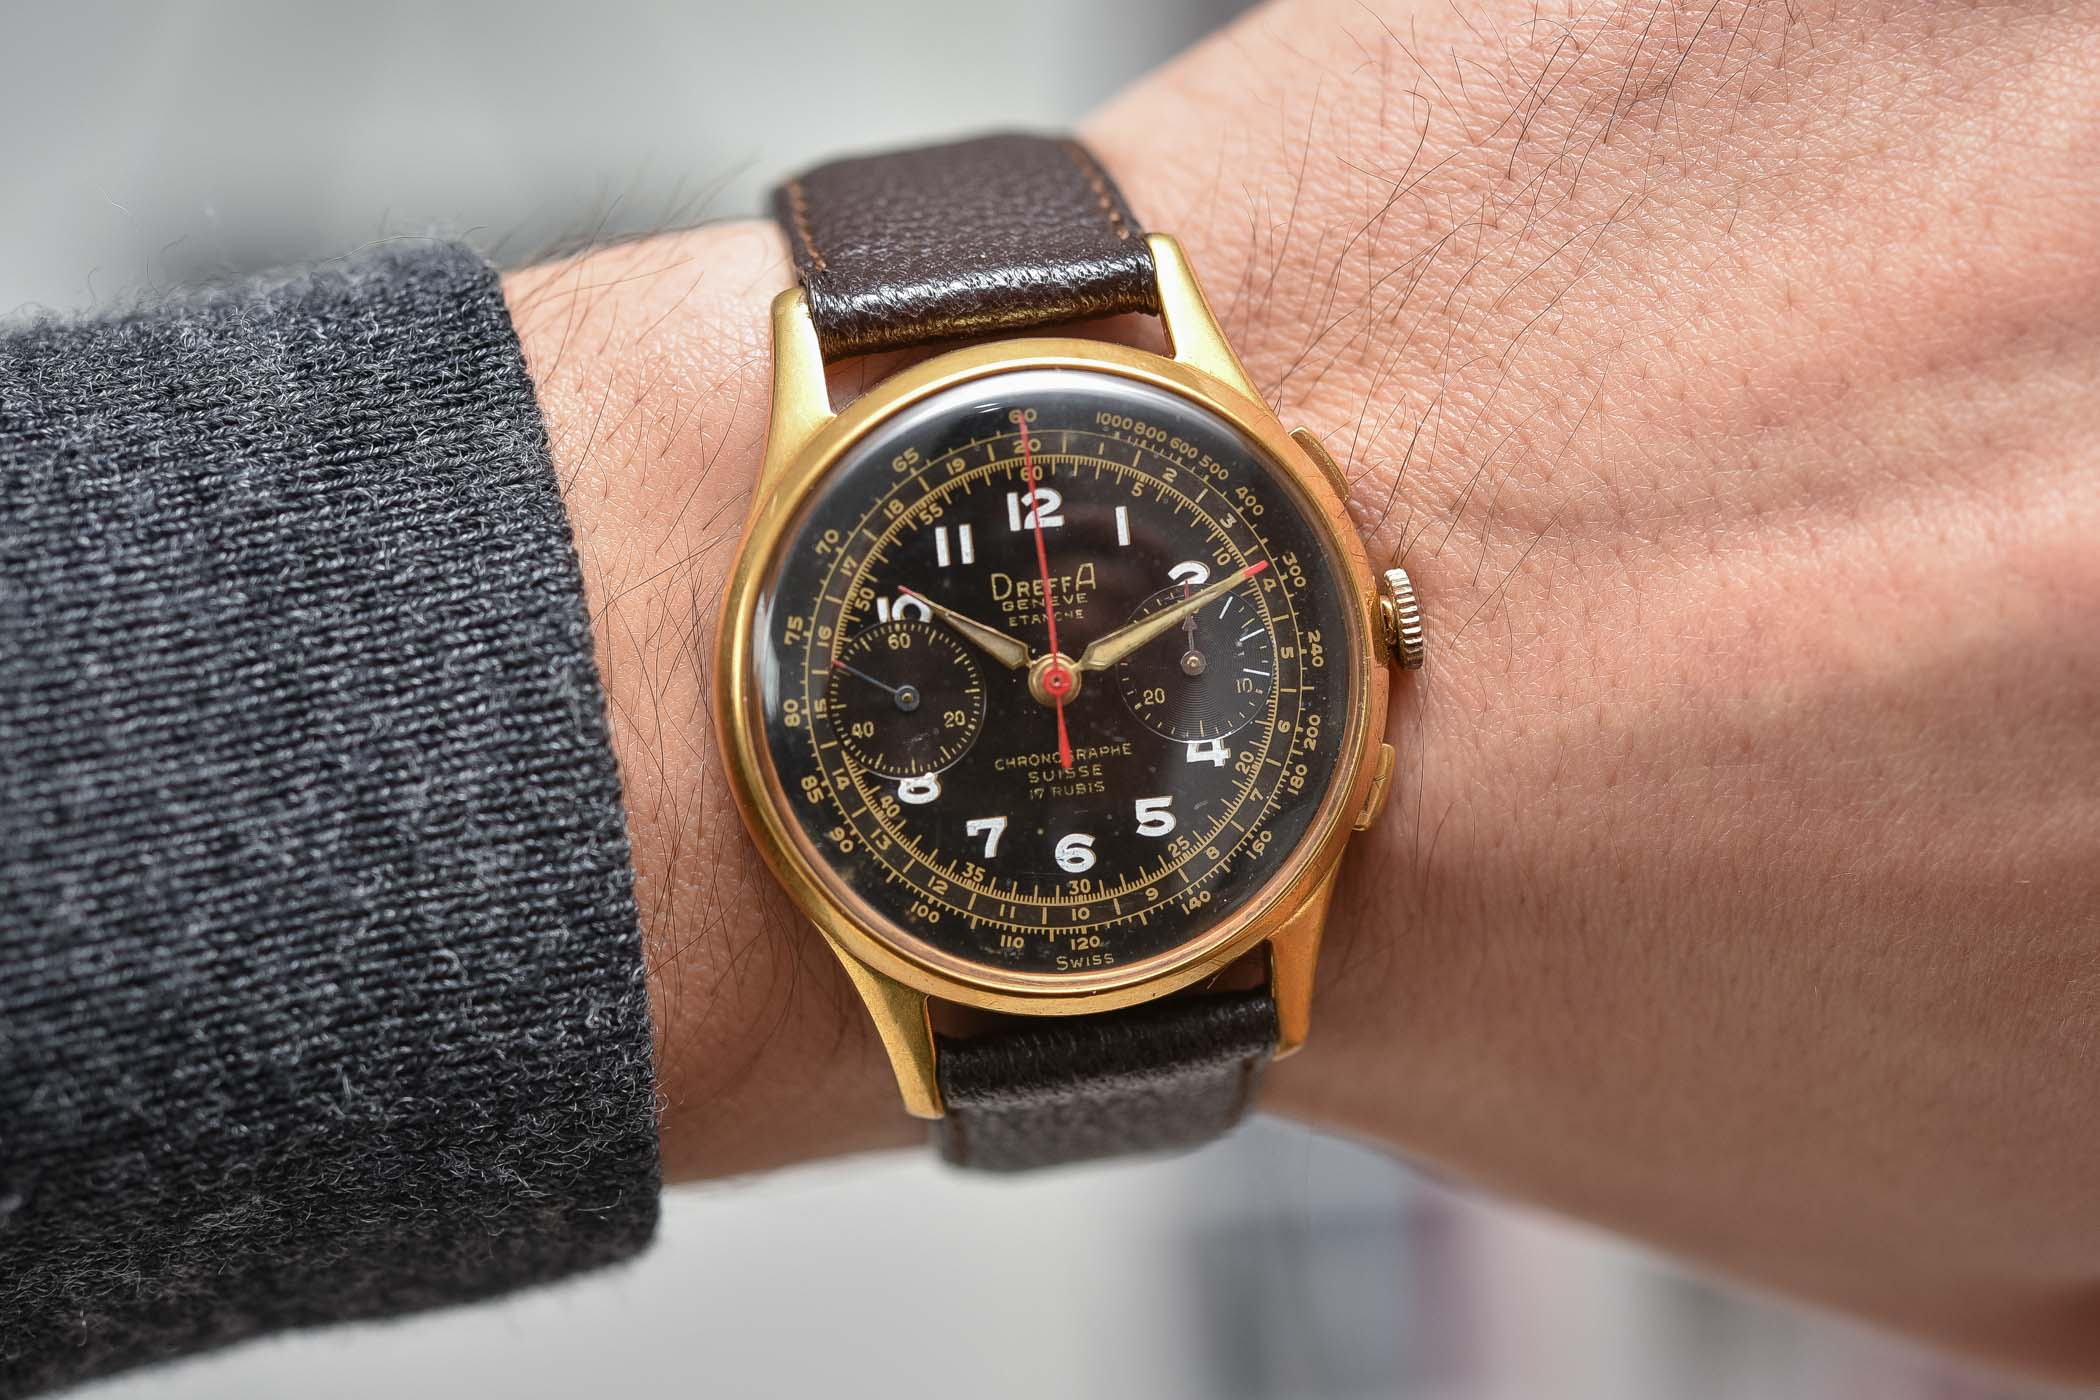 History of Chronographe Suisse Landeron Dreffa Ultimor Olympic - 2